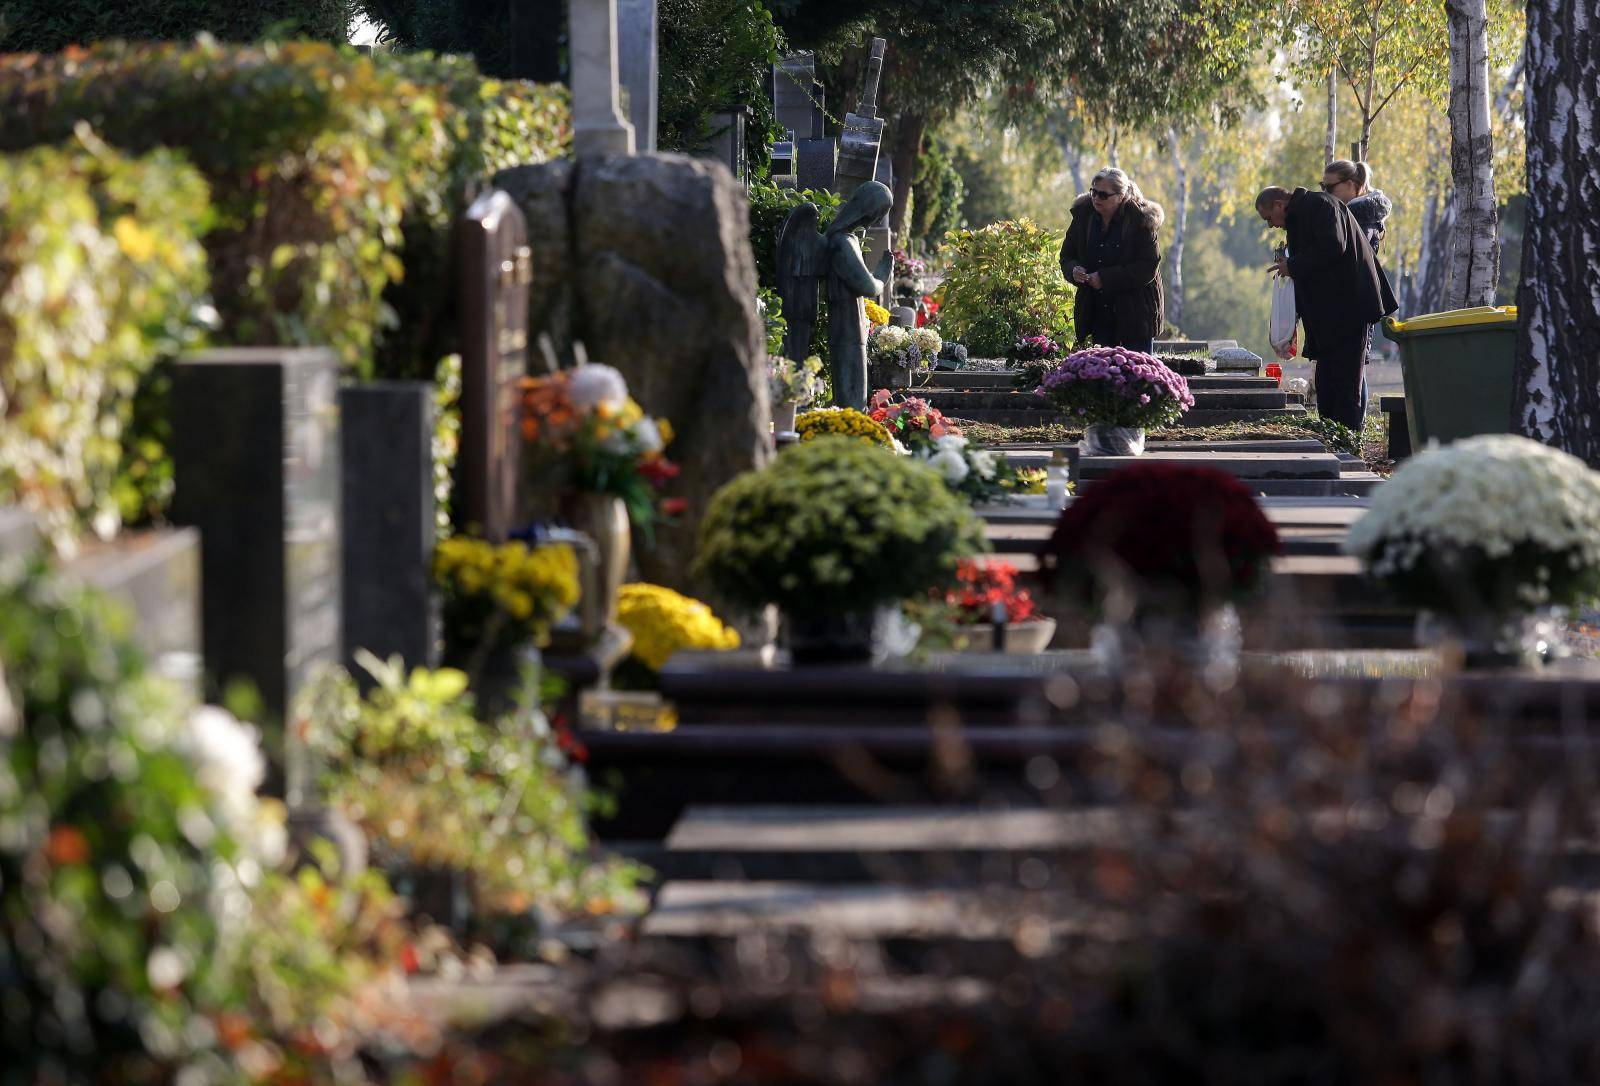 Građani obilaze zagrebačko groblje Mirogoj povodom blagdana Svih svetih